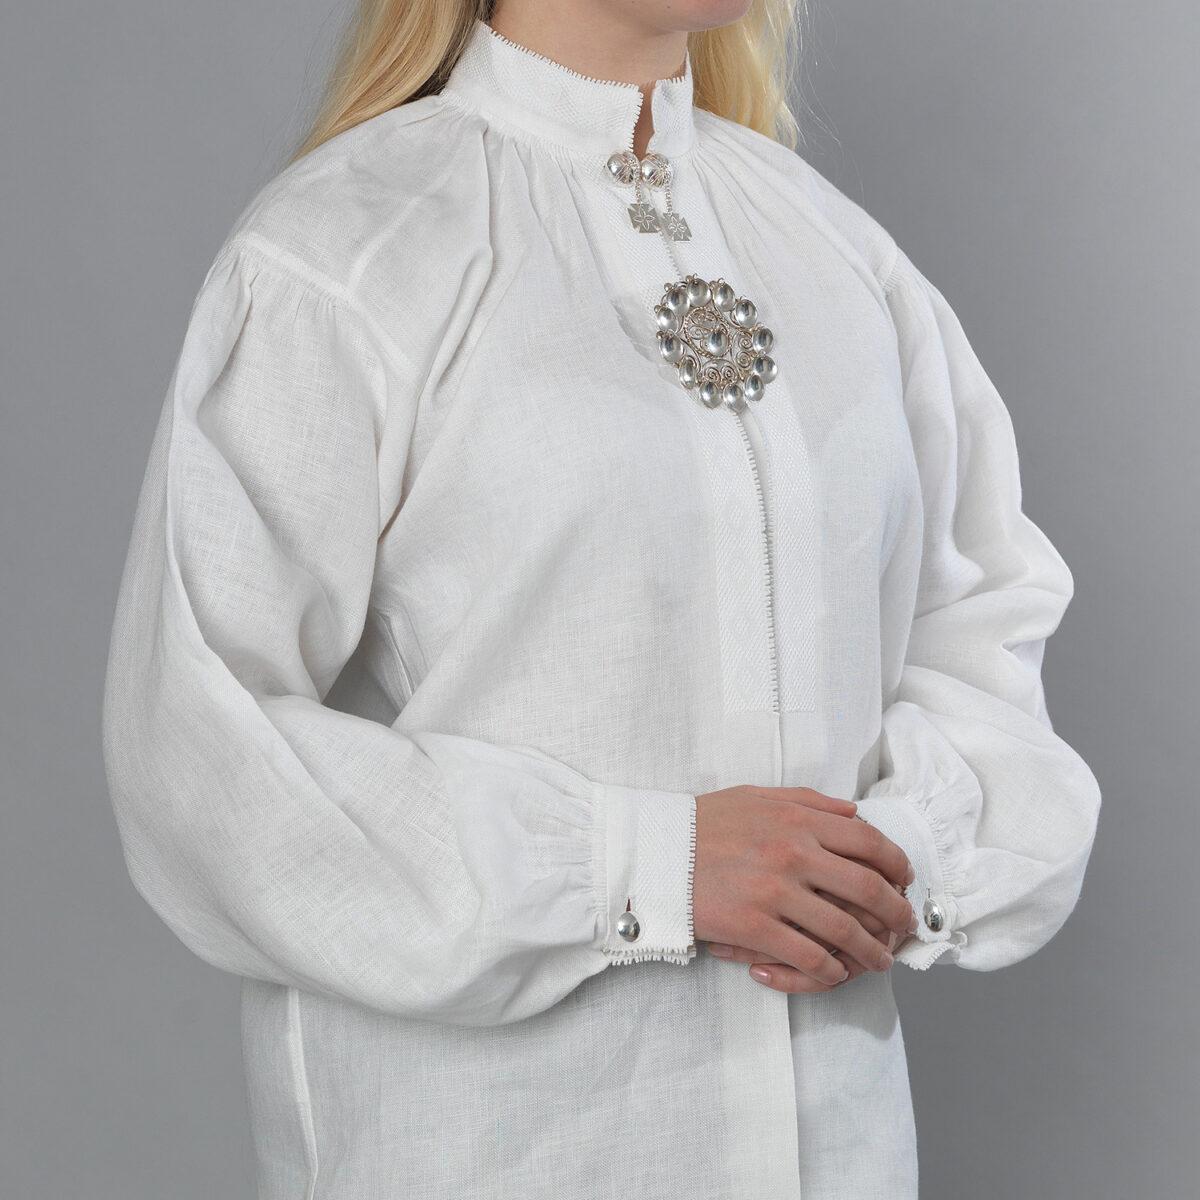 Rogaland linskjorte-454